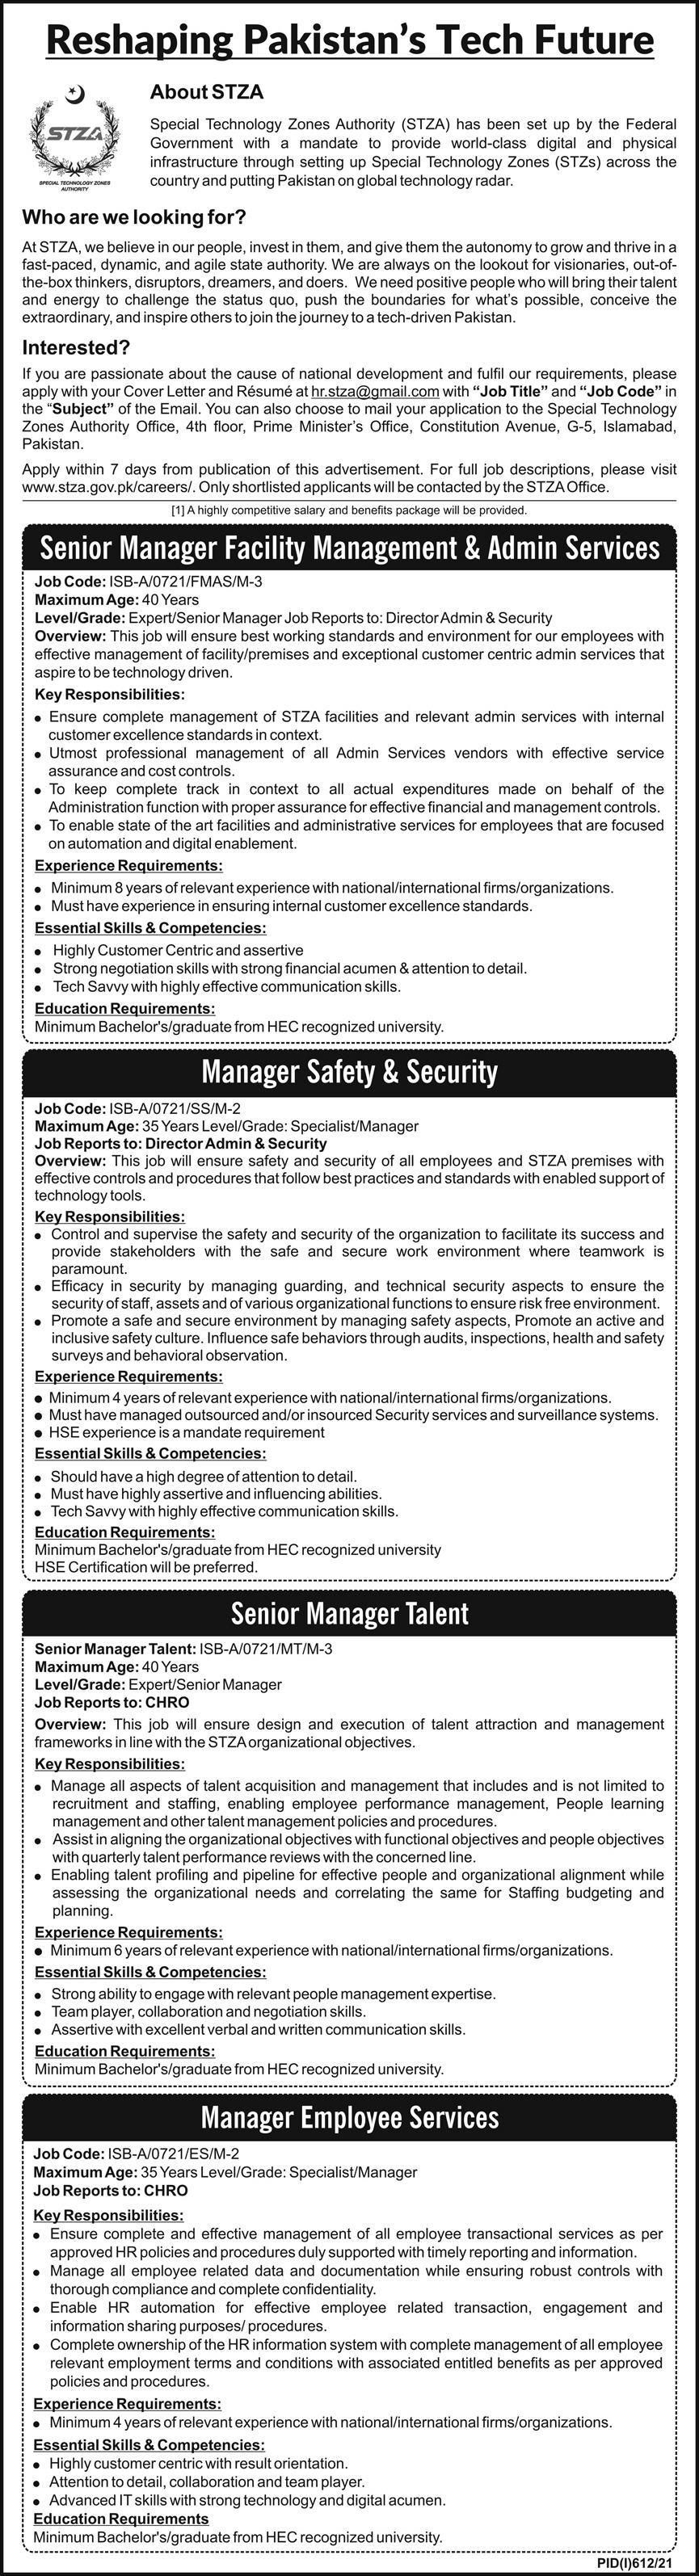 Reshaping Pakistan Tech Future Management Jobs 2021